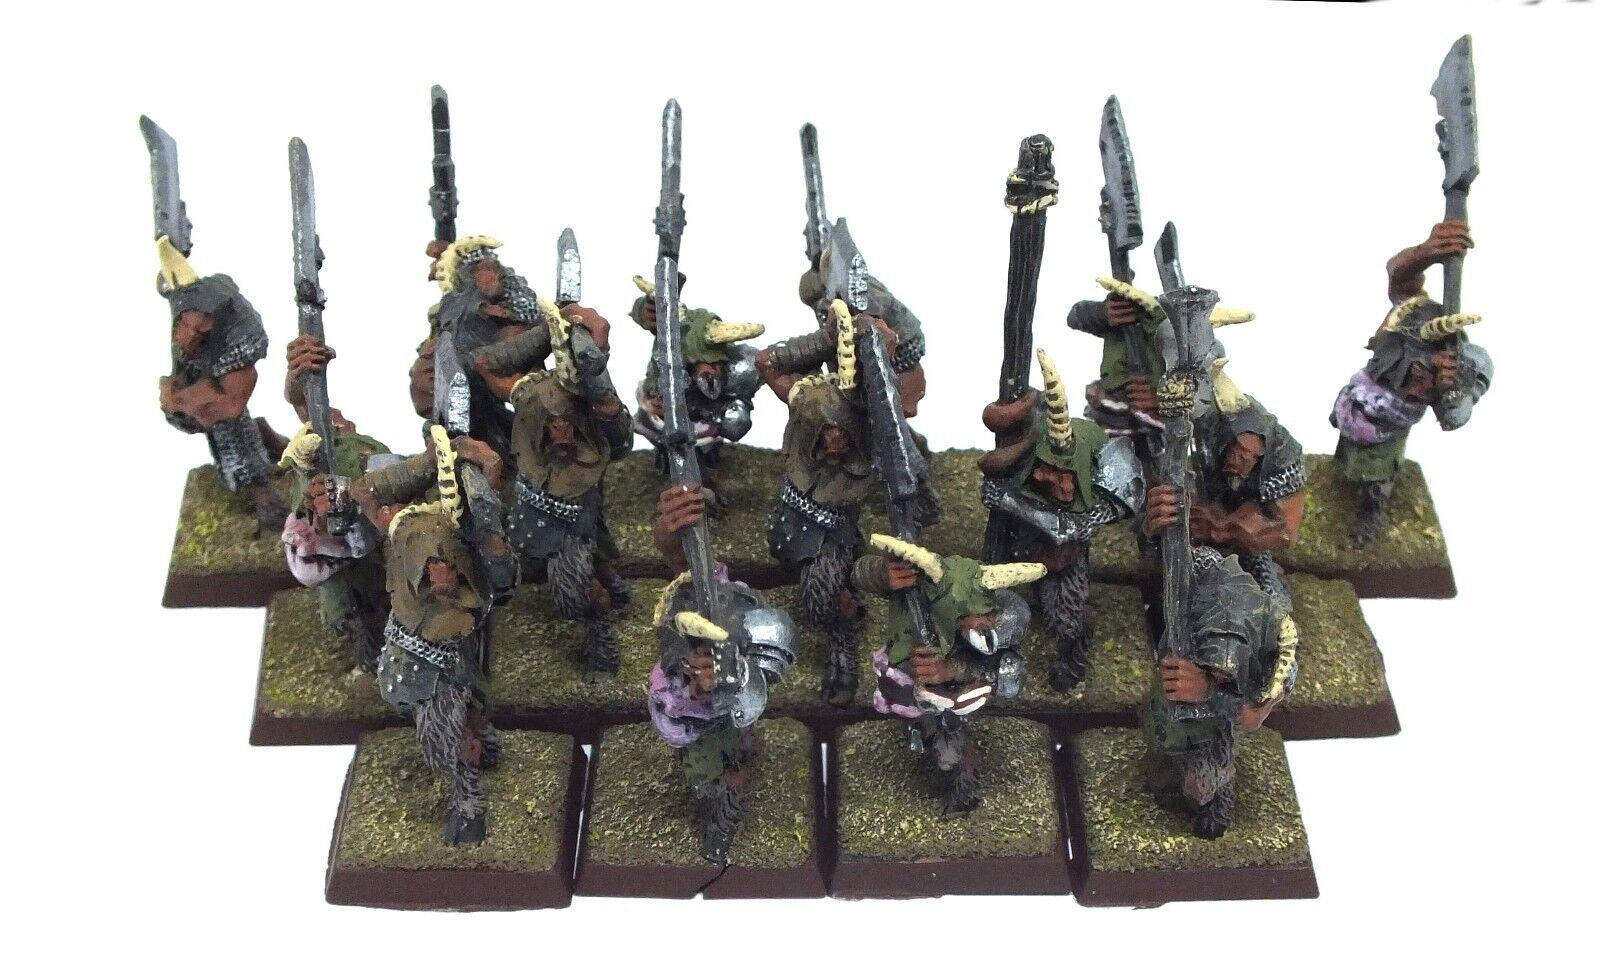 Warhammer Fantasy - Beastmen Besteigor herd (painted) - 28mm